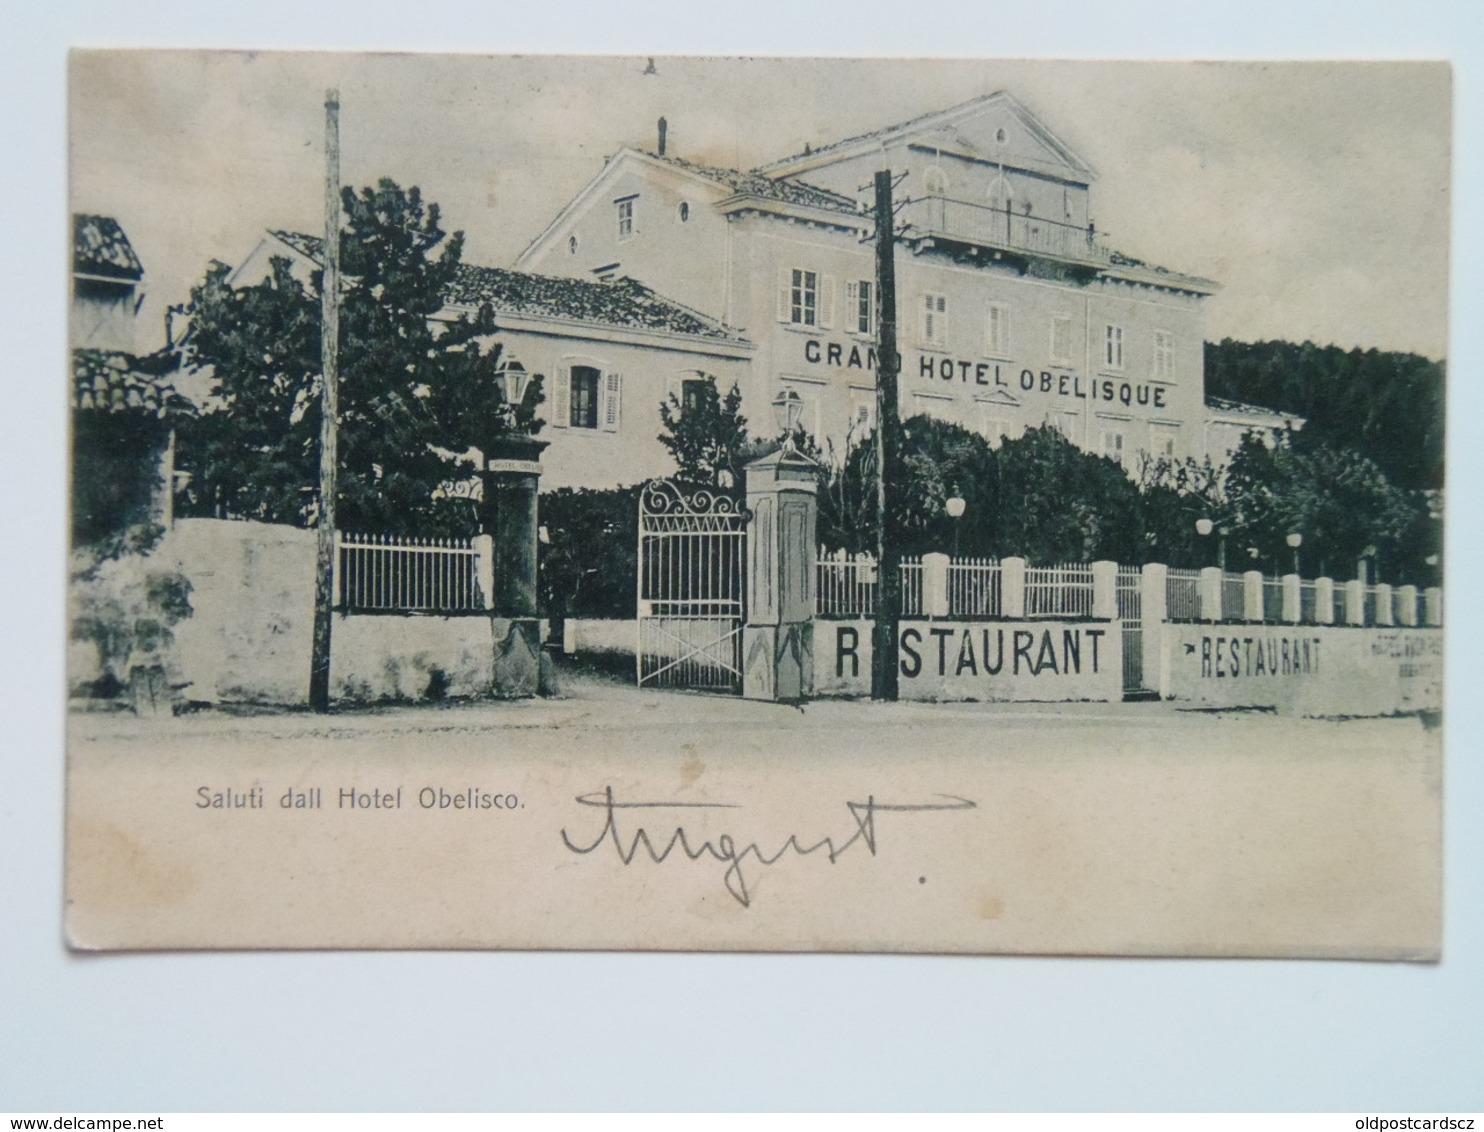 Trieste 343 Opcina Opicina Auto 1900 Albergo Hotel Grand Obeliscque Obelisco Restauranr - Italie